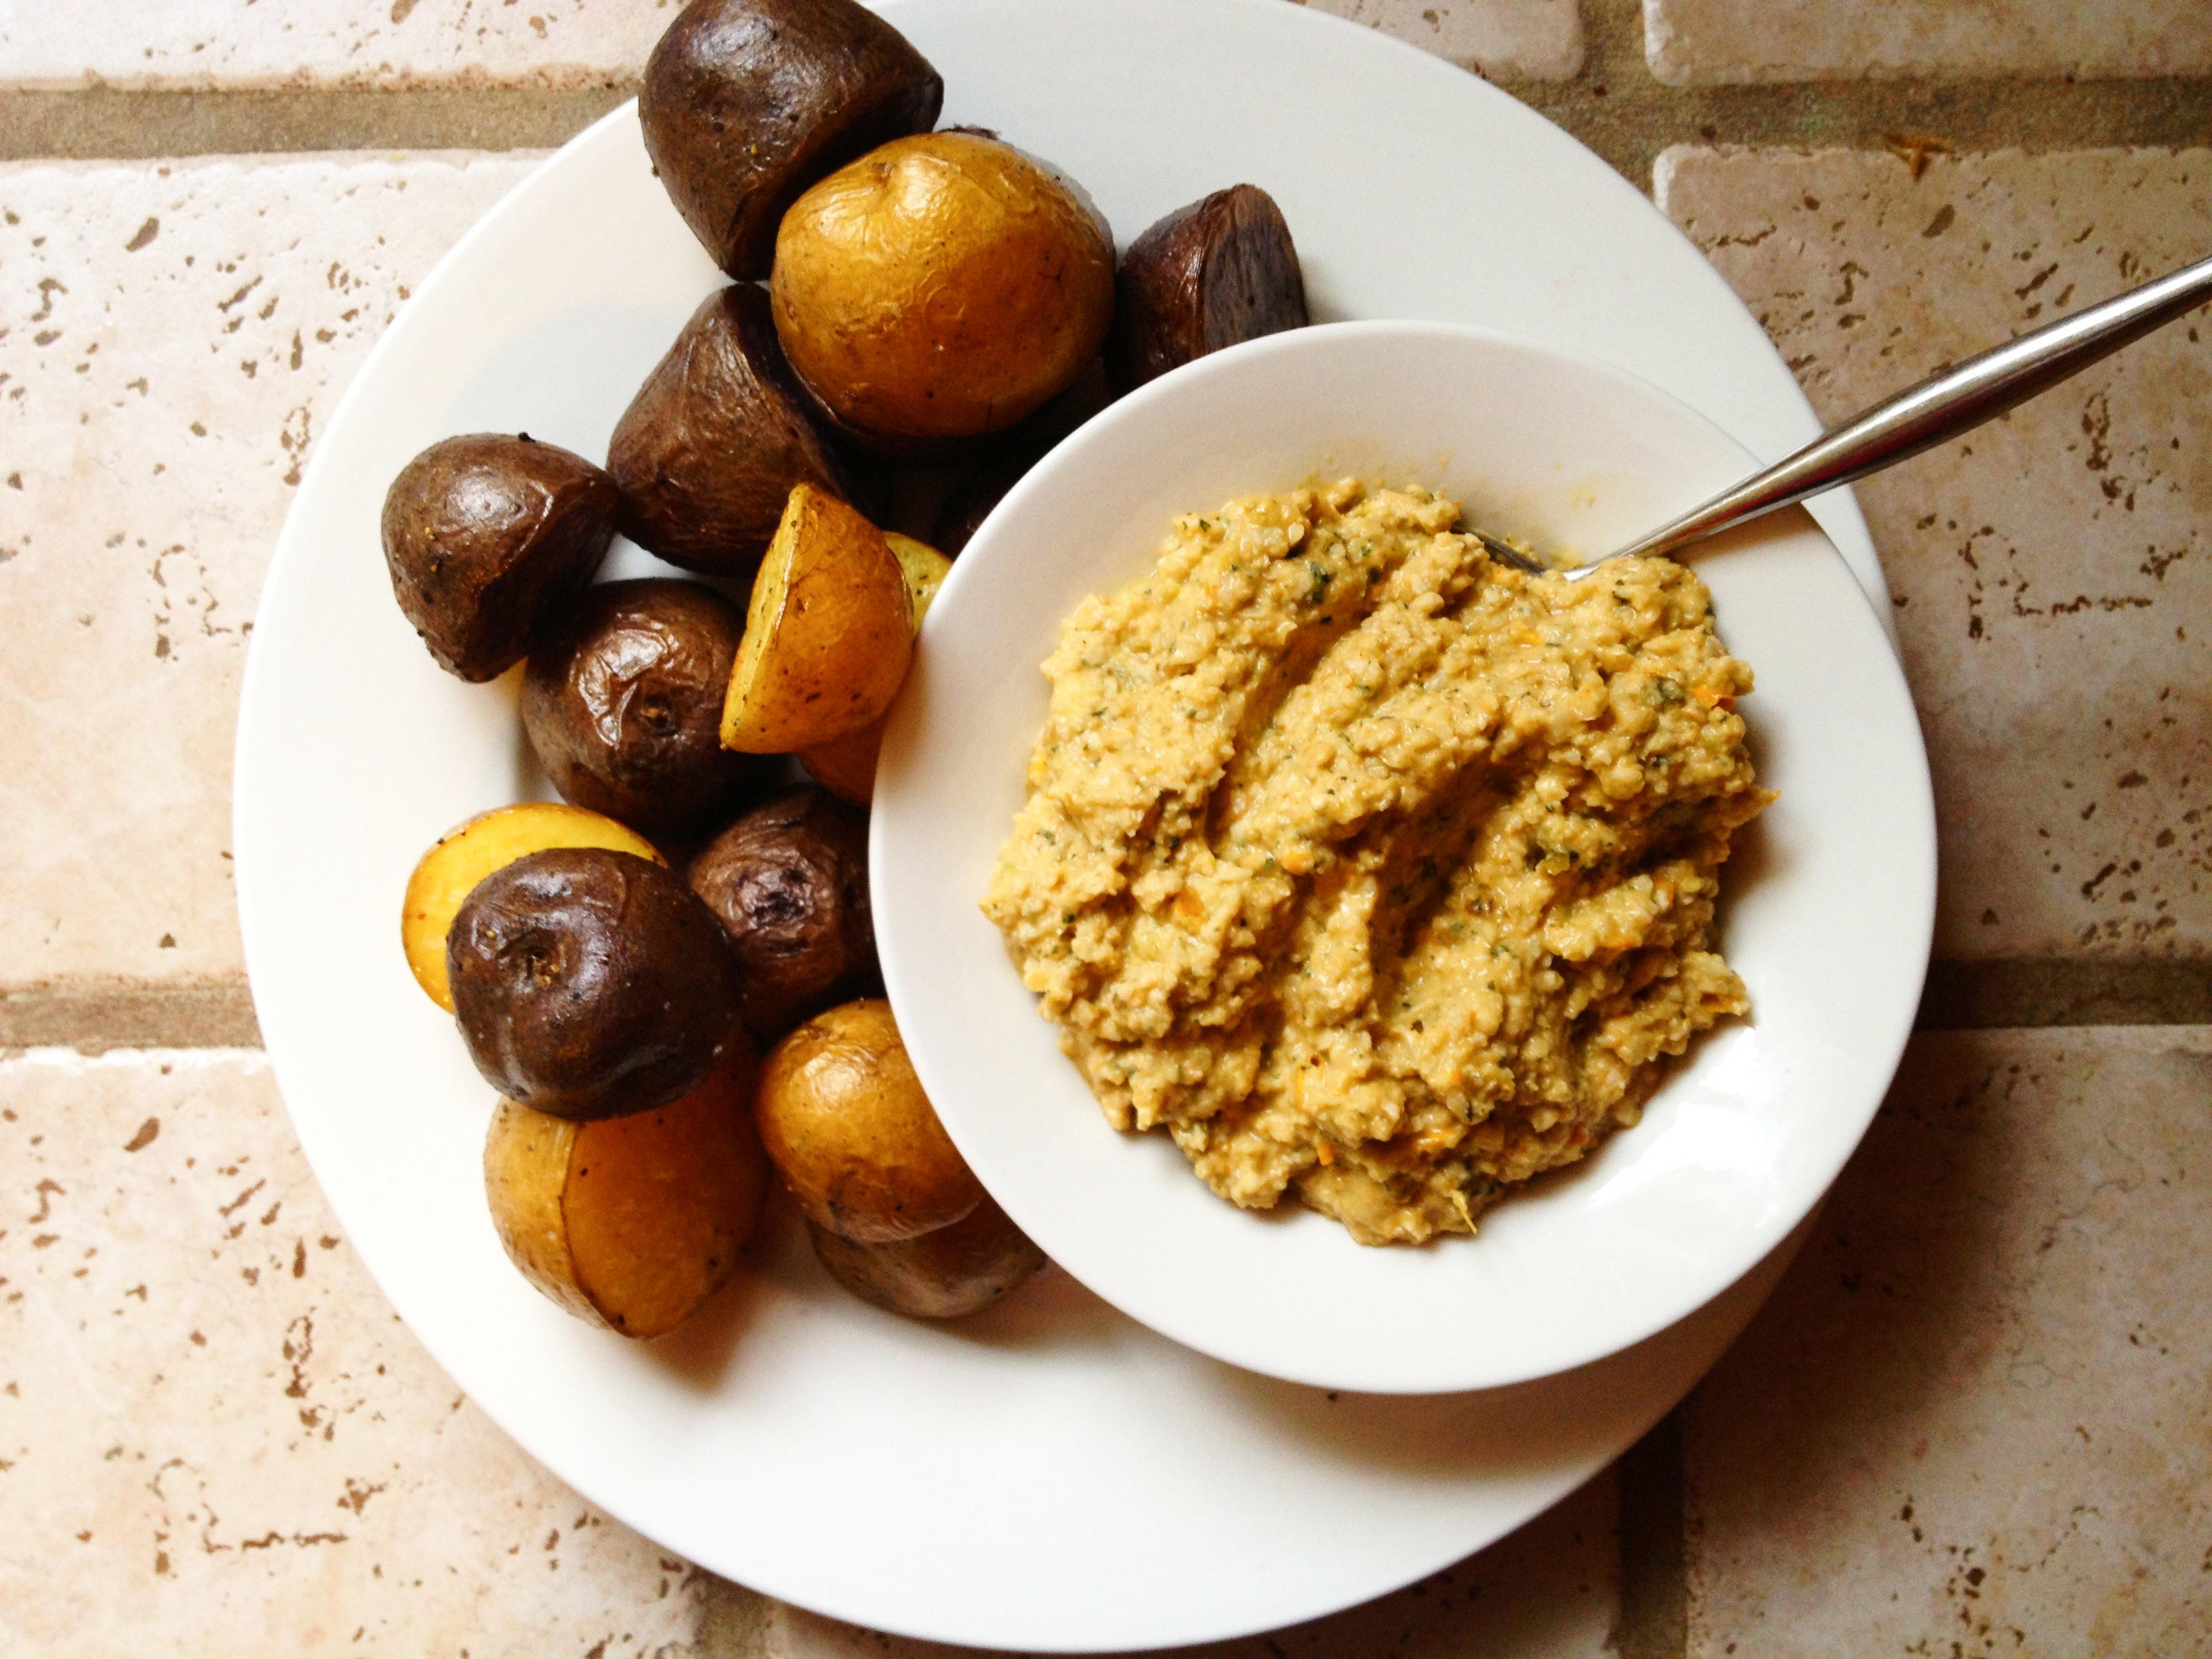 ... romesco sauce lemon and romesco sauce halibut hazelnuts hazelnut